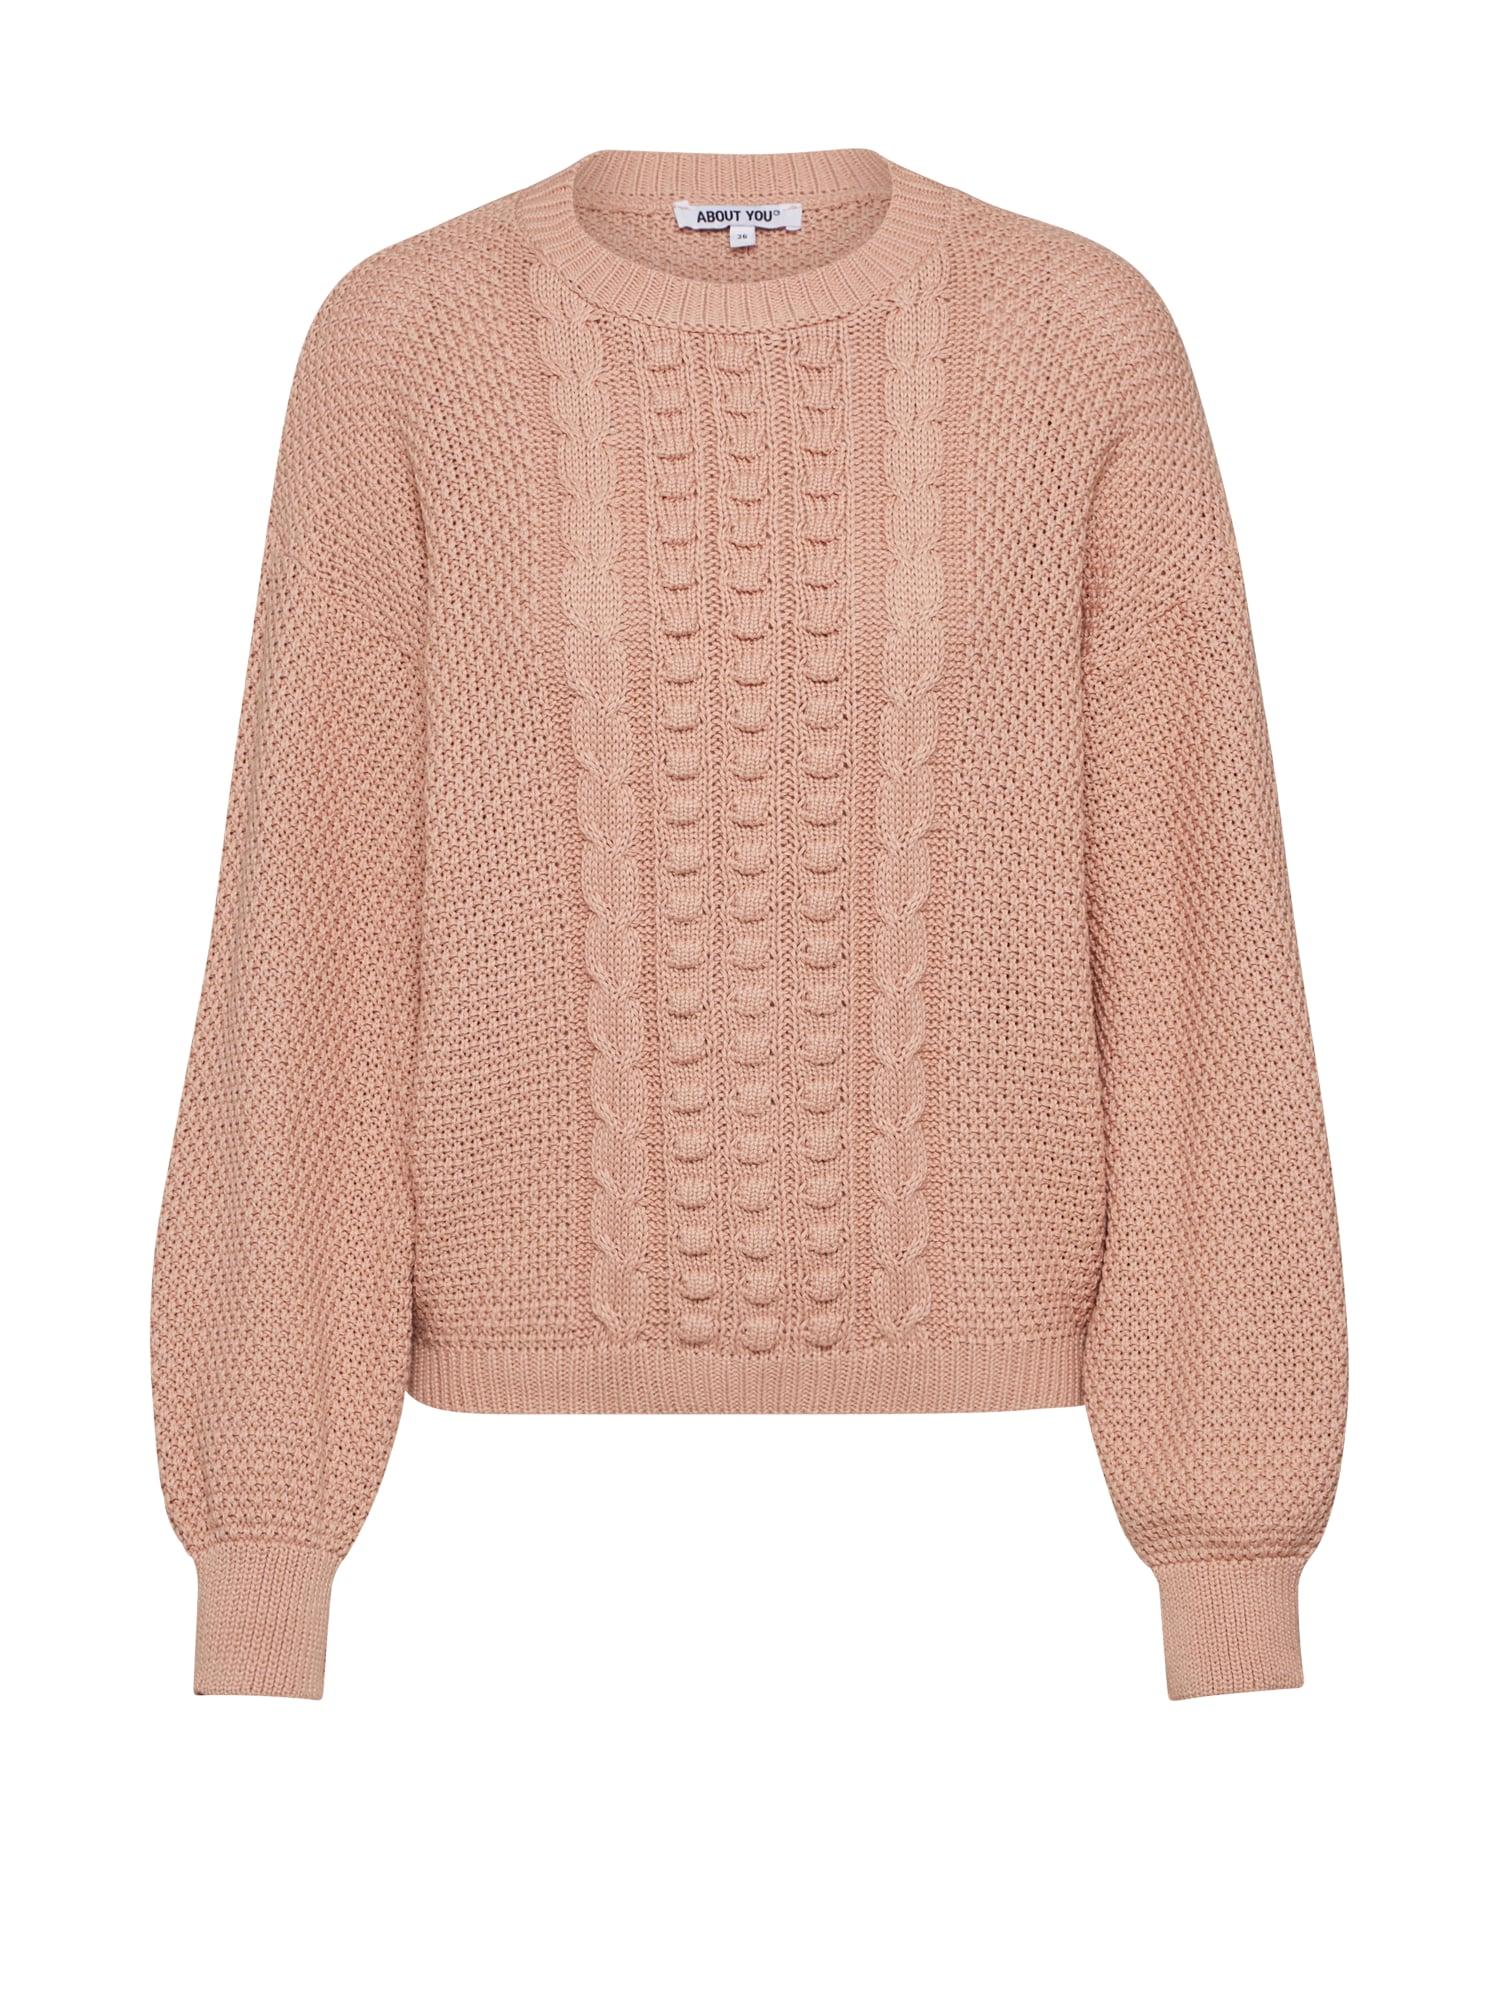 ABOUT YOU Megztinis 'Leona' smėlio